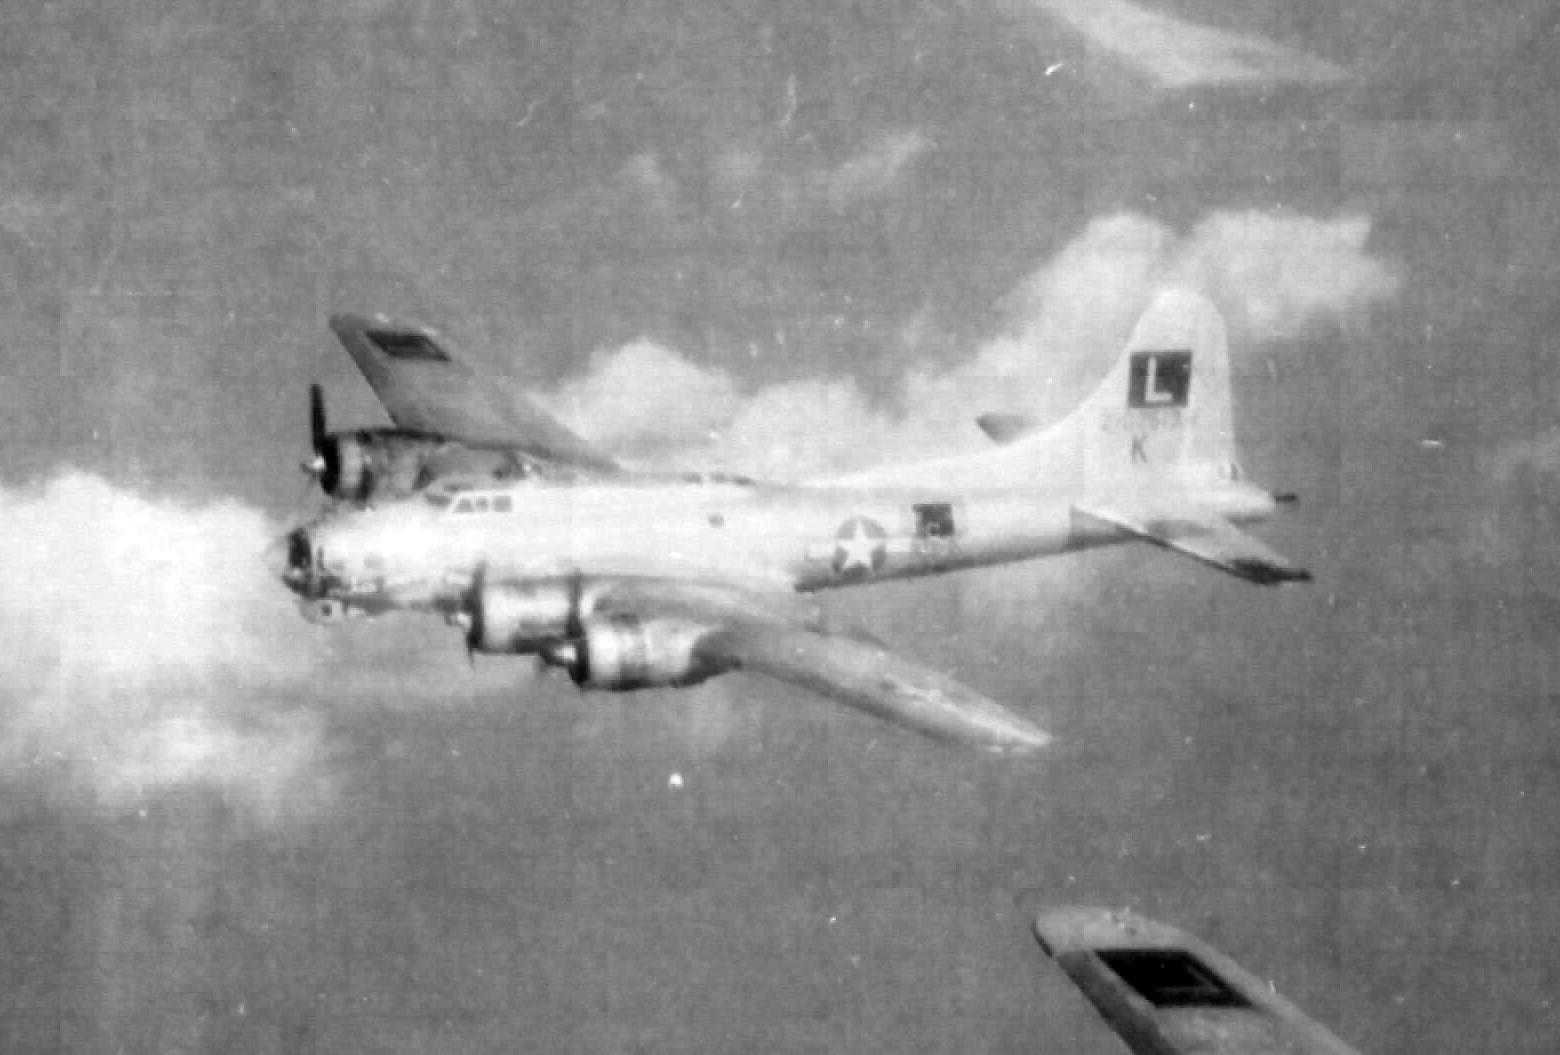 B-17 #42-102513 / Swing Shift Baby